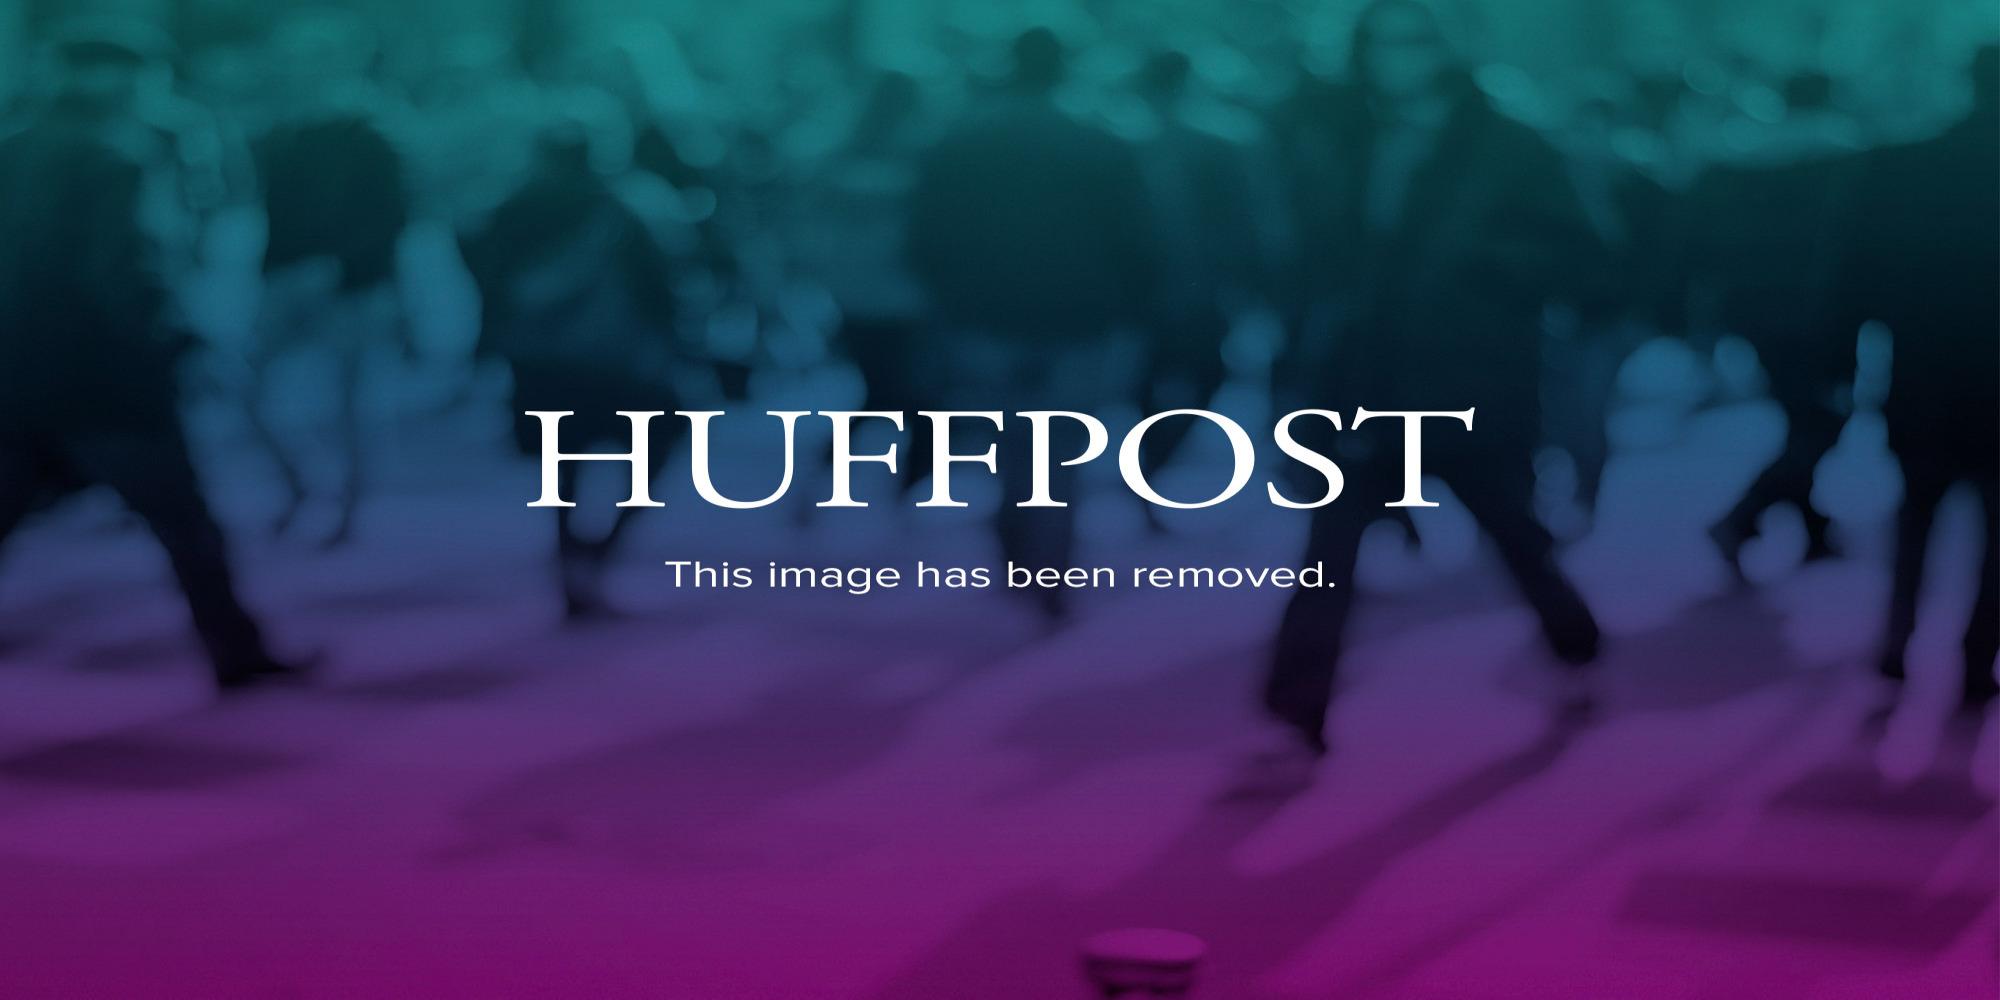 https://i2.wp.com/i.huffpost.com/gen/1784494/images/o-BOKO-HARAM-KIDNAPPED-facebook.jpg